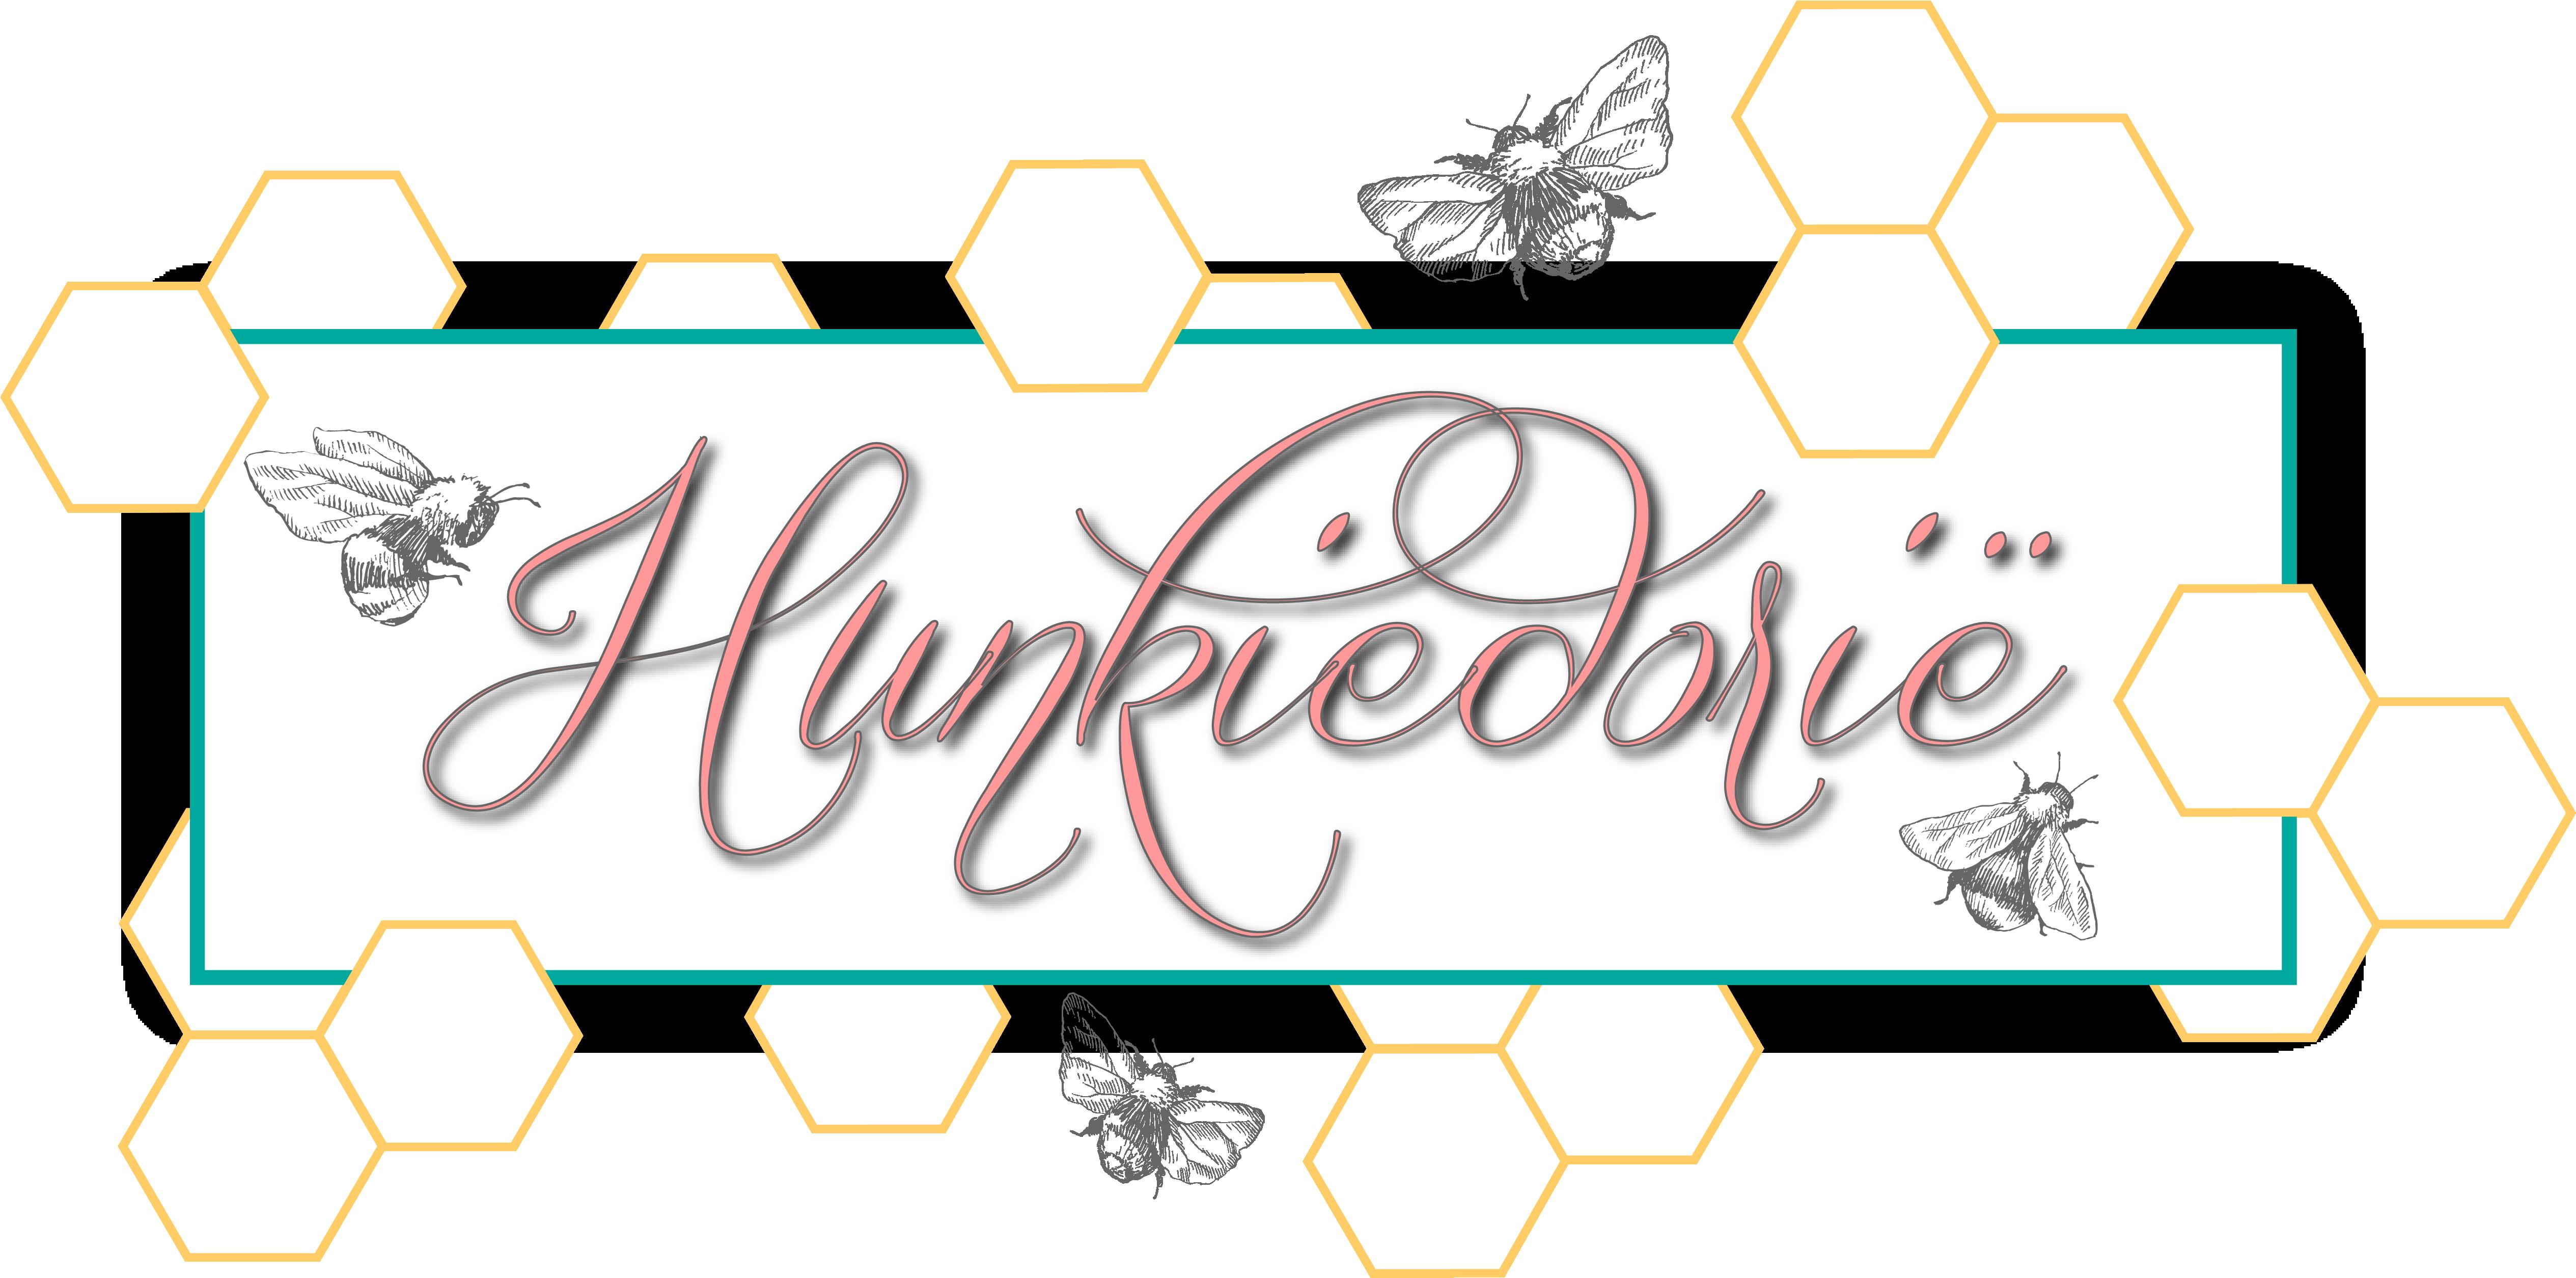 Hunkiedorië